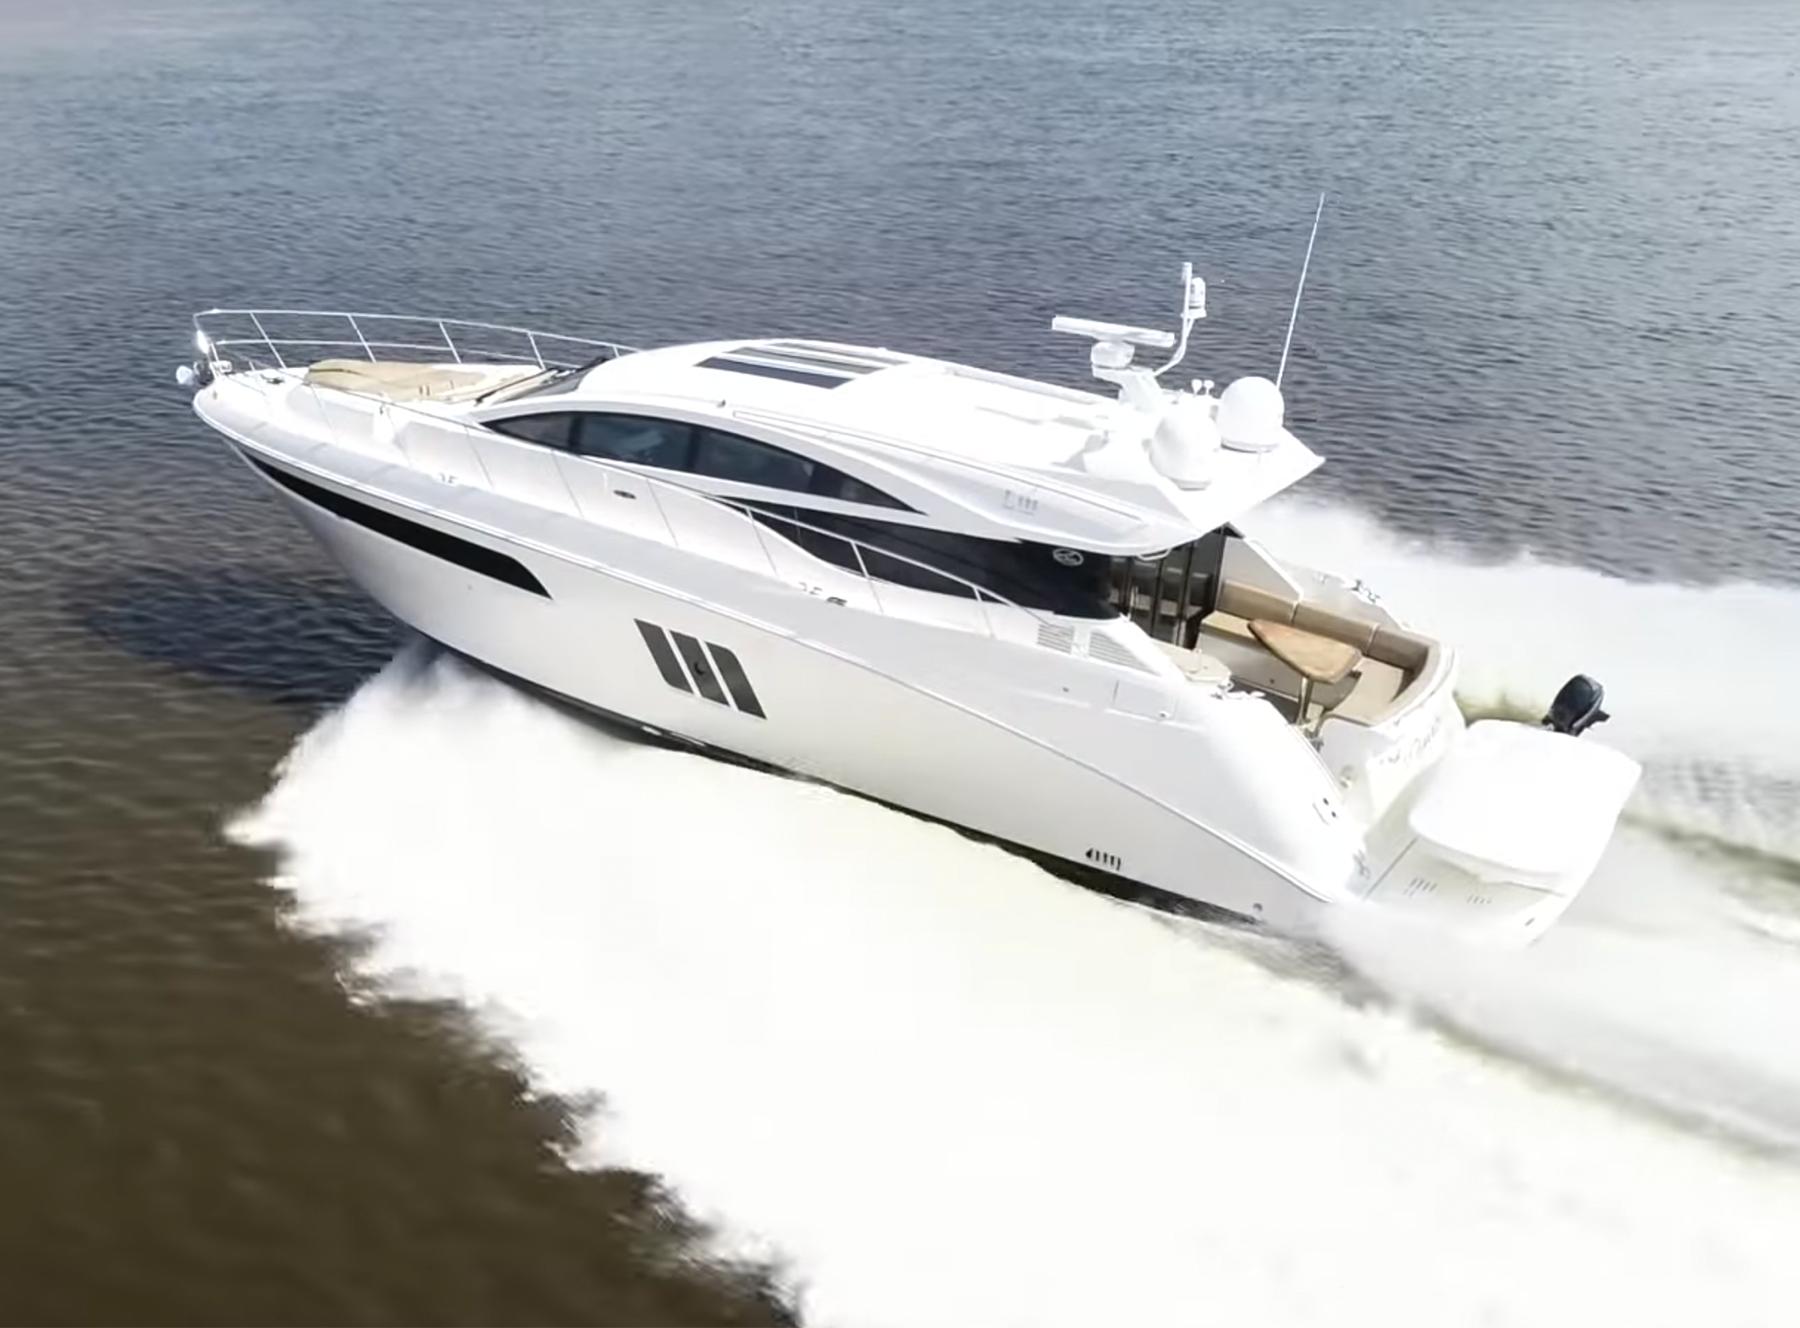 Yacht Walkthrough: Sea Ray L590 Motoryacht